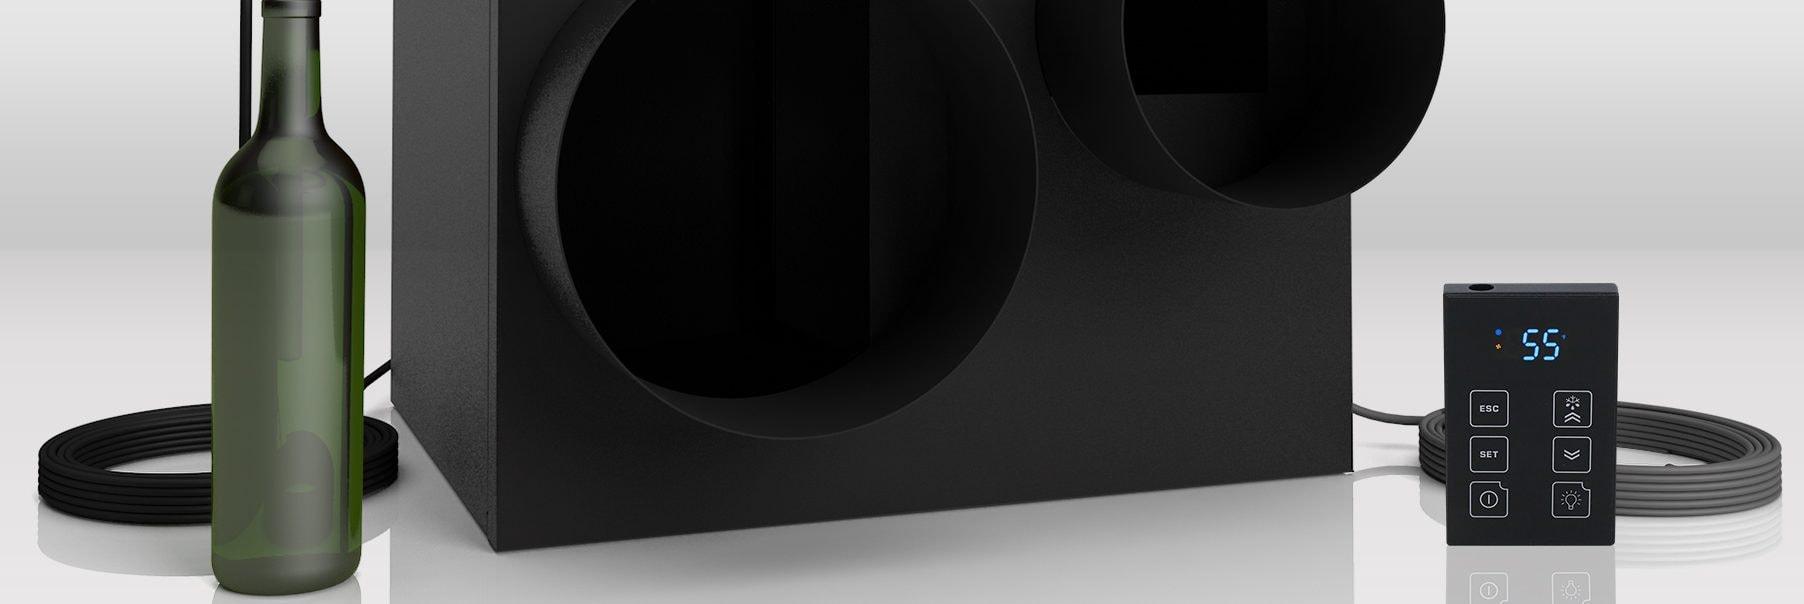 Platinum Split 4000 3Q Fully Ducted e1613507453460